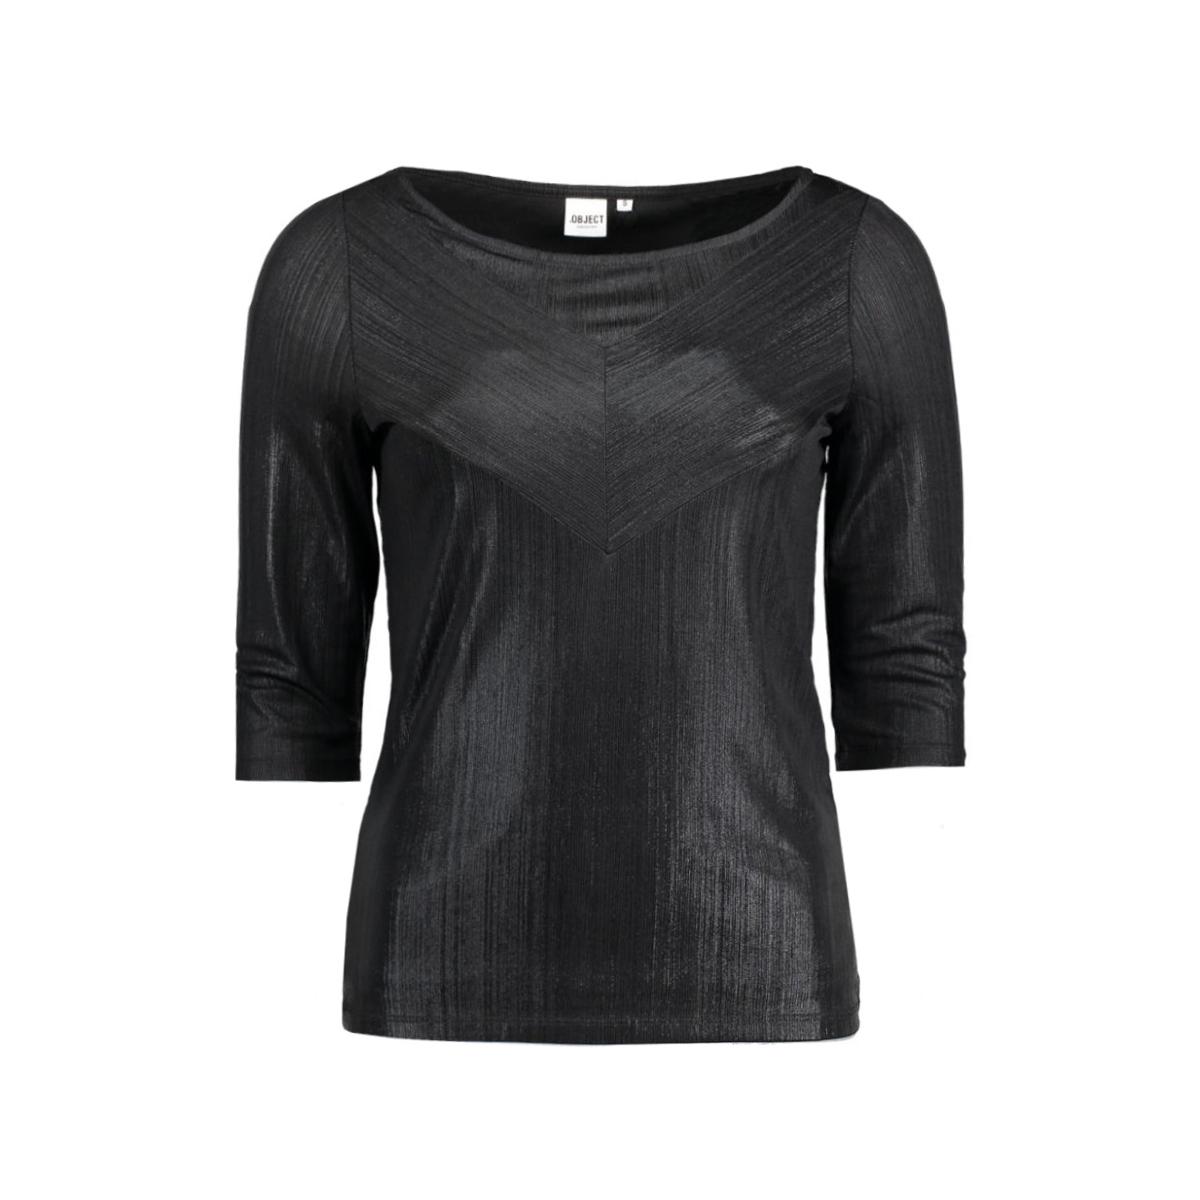 objlotus  3/4 top 23024040 object t-shirt black